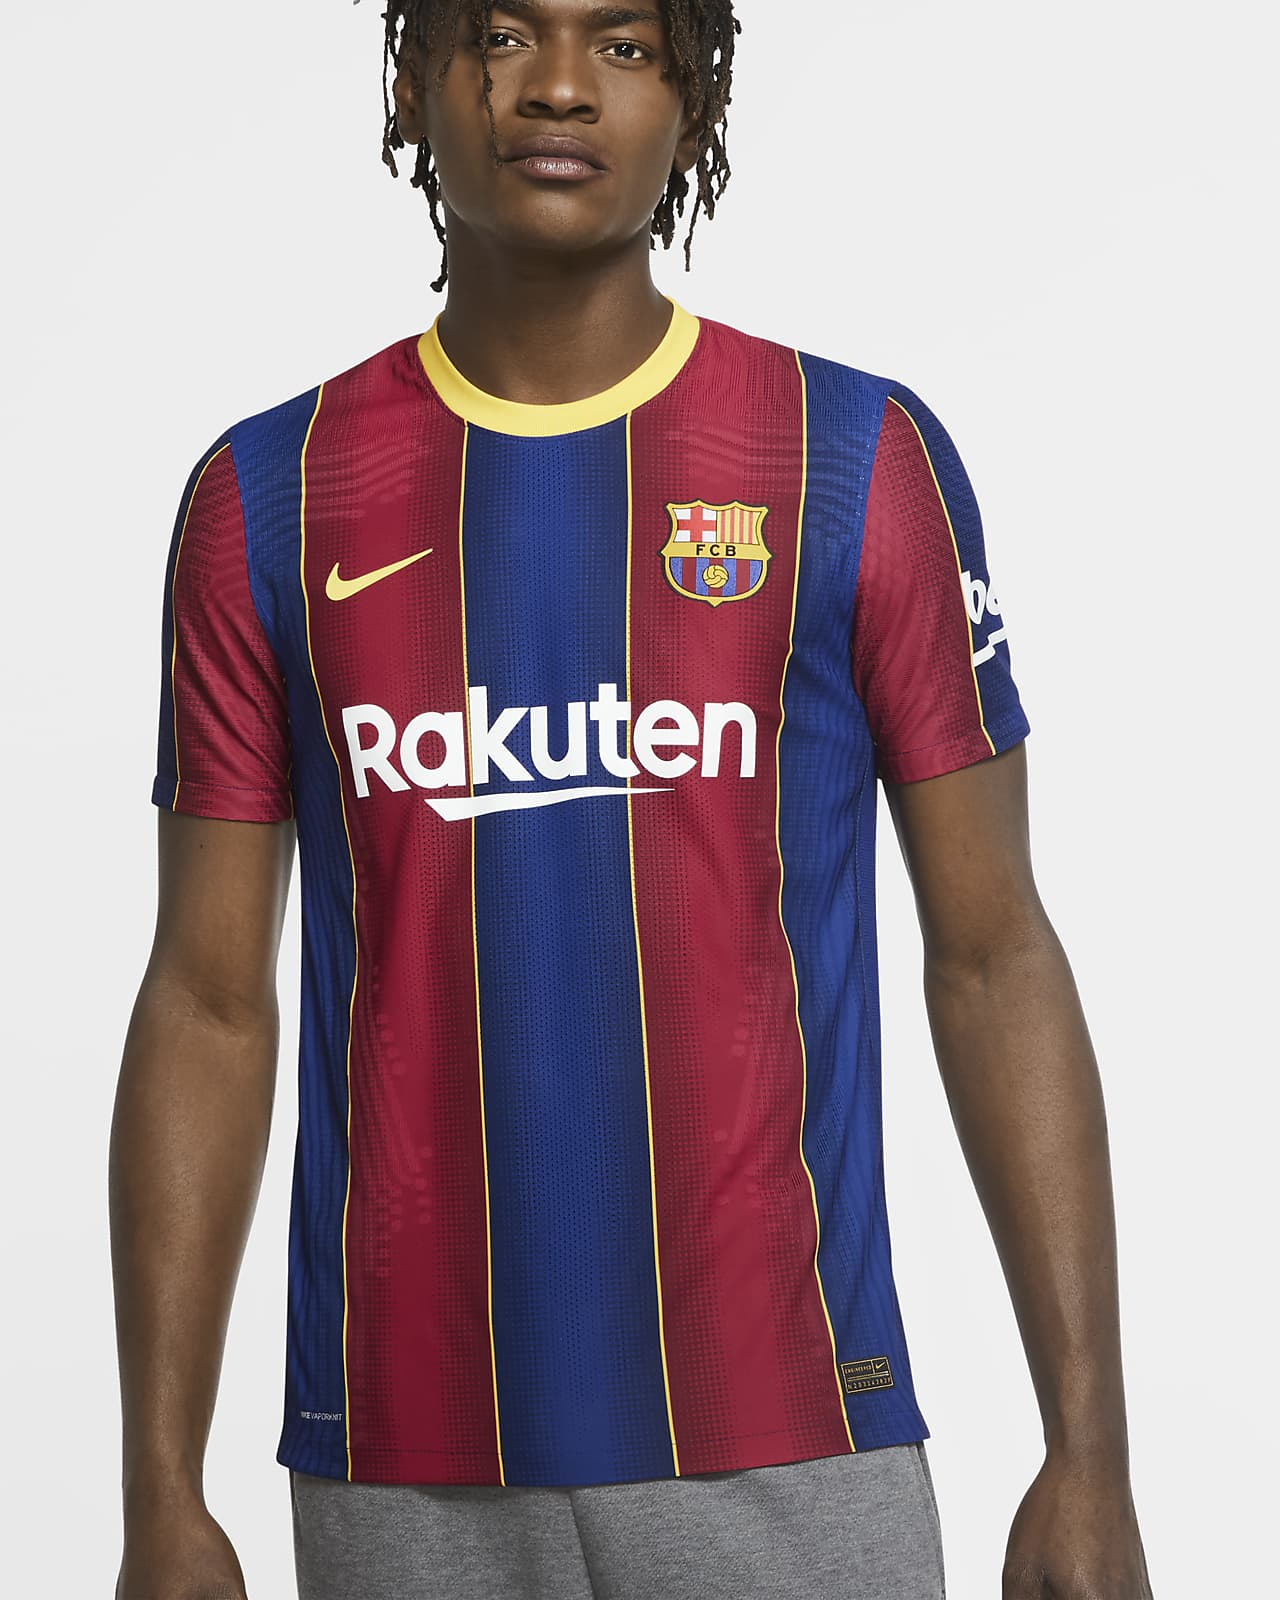 Buy barcelona maglia cheap online